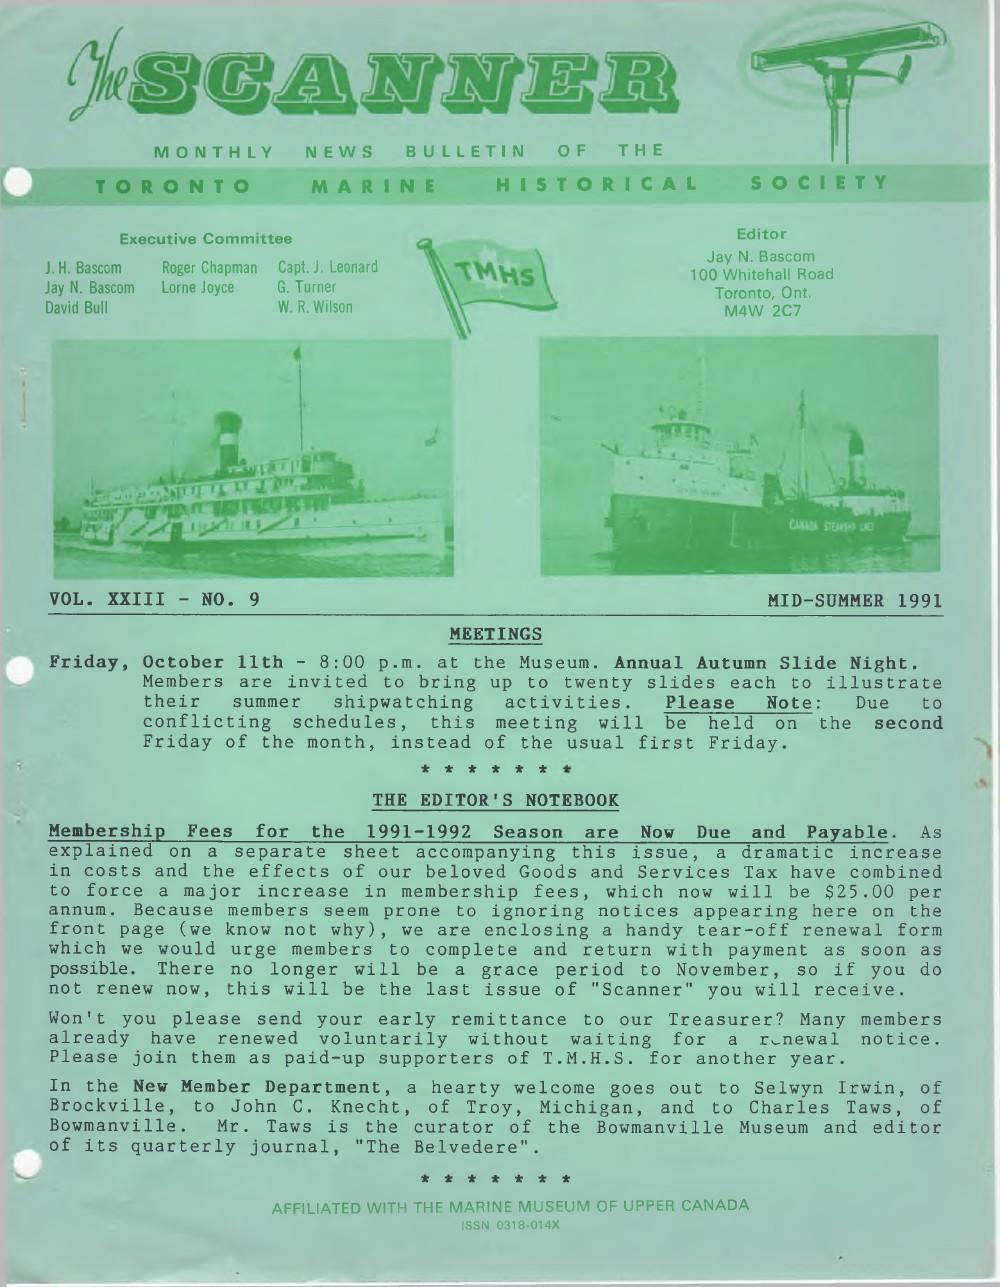 Scanner, v. 23, no. 9 (Mid-Summer 1991)